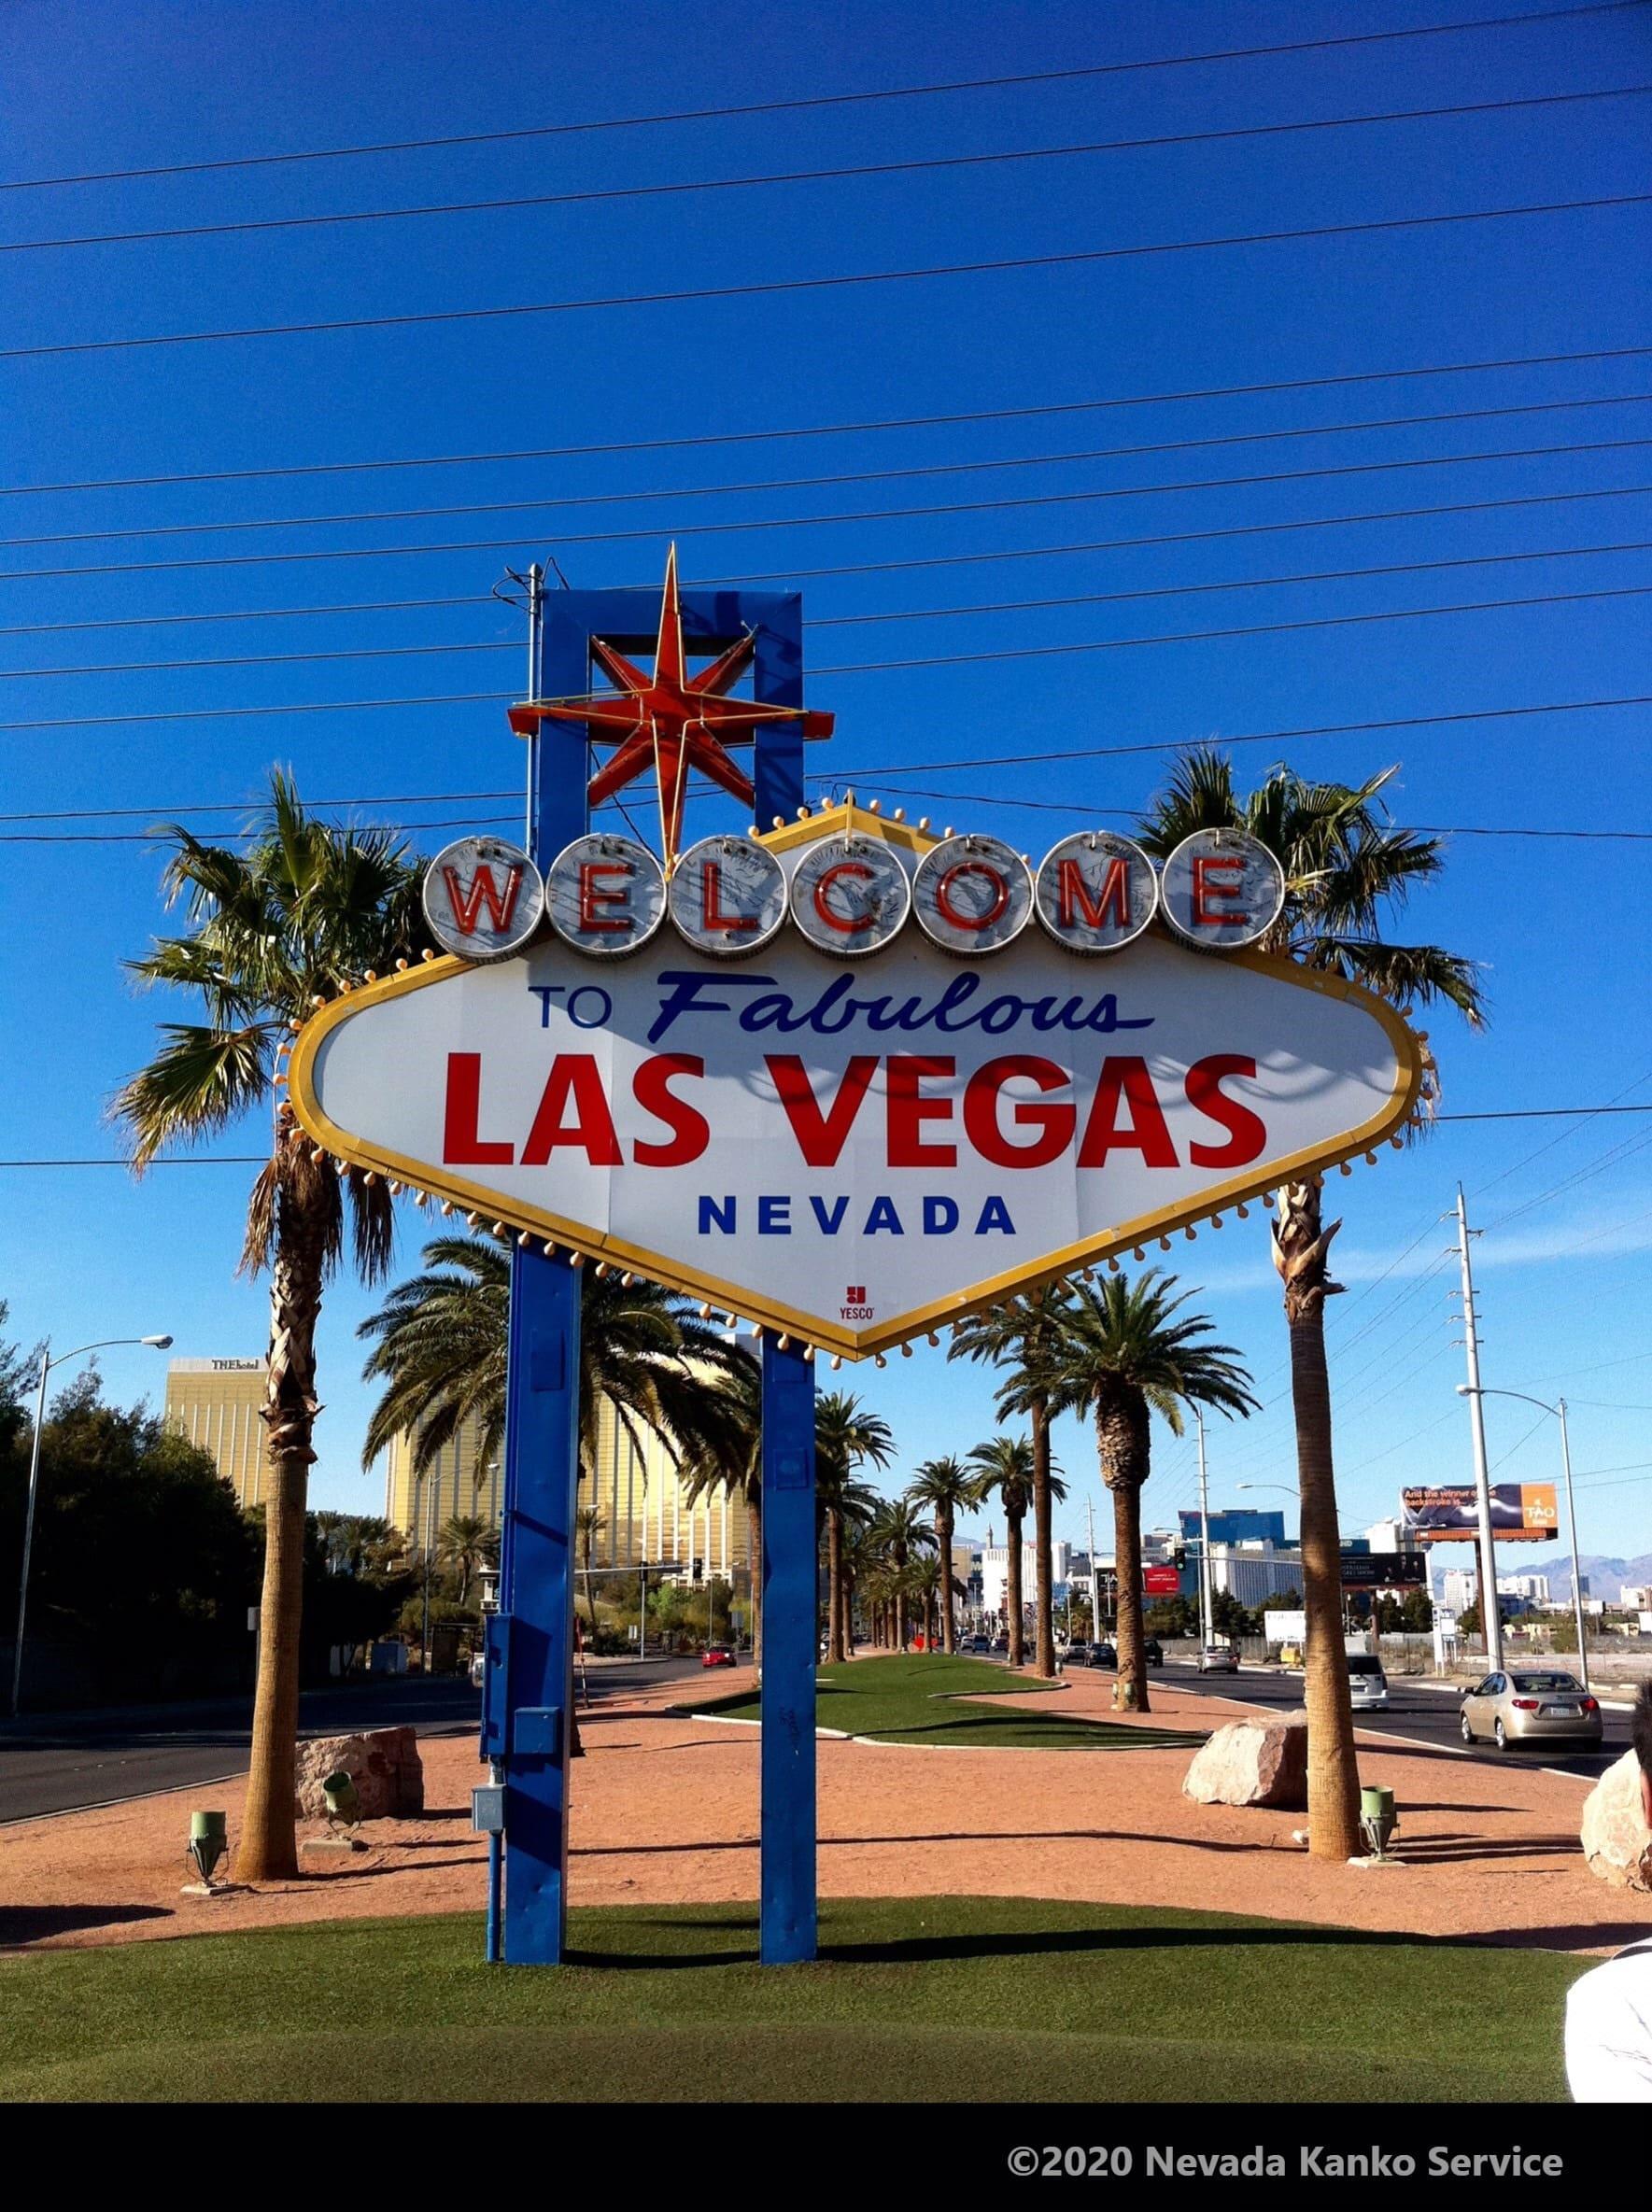 Las Vegas サイン